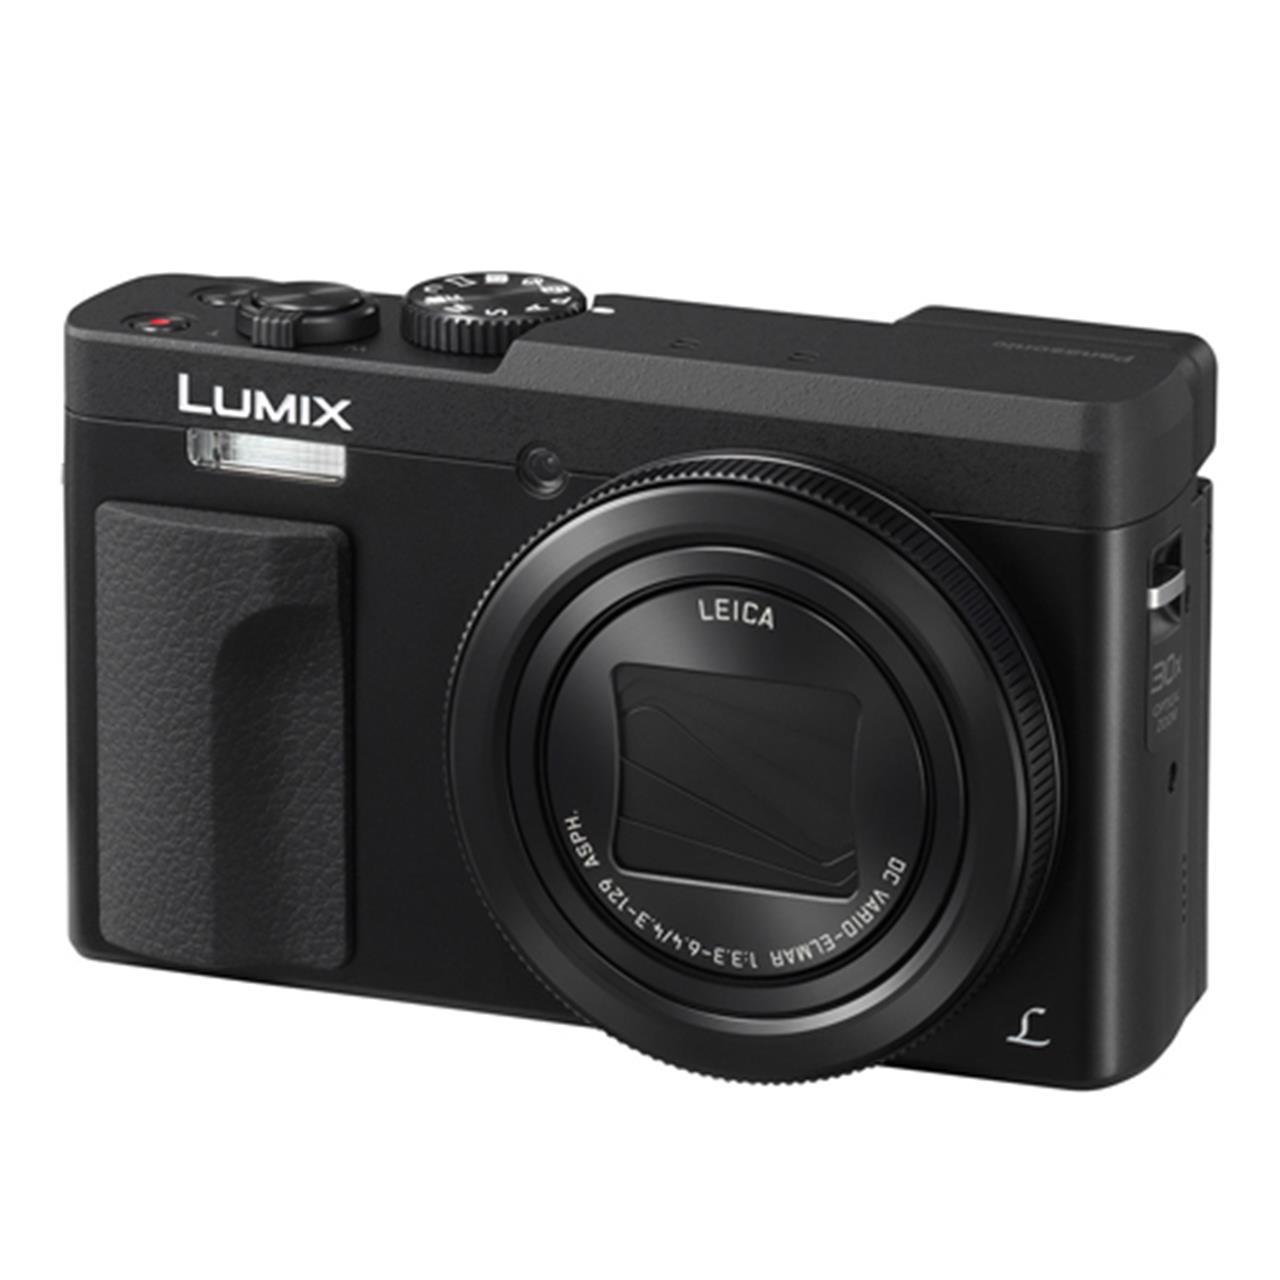 5025232867769__lumix_dmc_tz90_zwart_compact_camera_van_panasonic_off.jpg